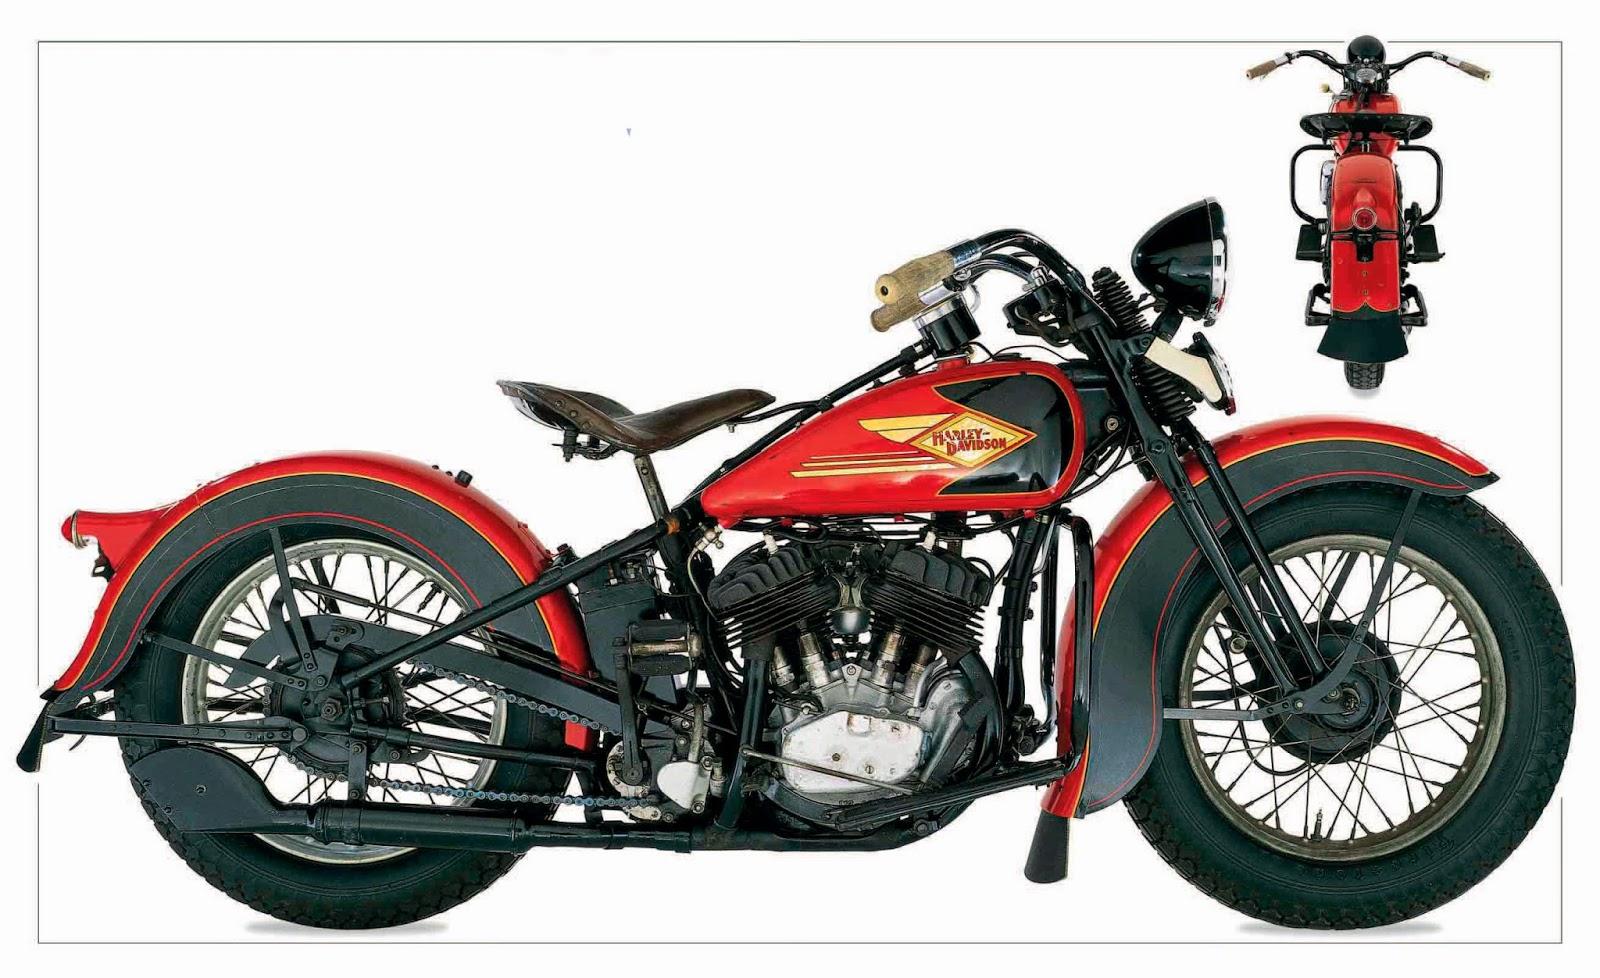 harley davidson 1935 rl harley davidson harley davidson 1935 rl harley sidecar fender wire diagram  [ 1600 x 978 Pixel ]